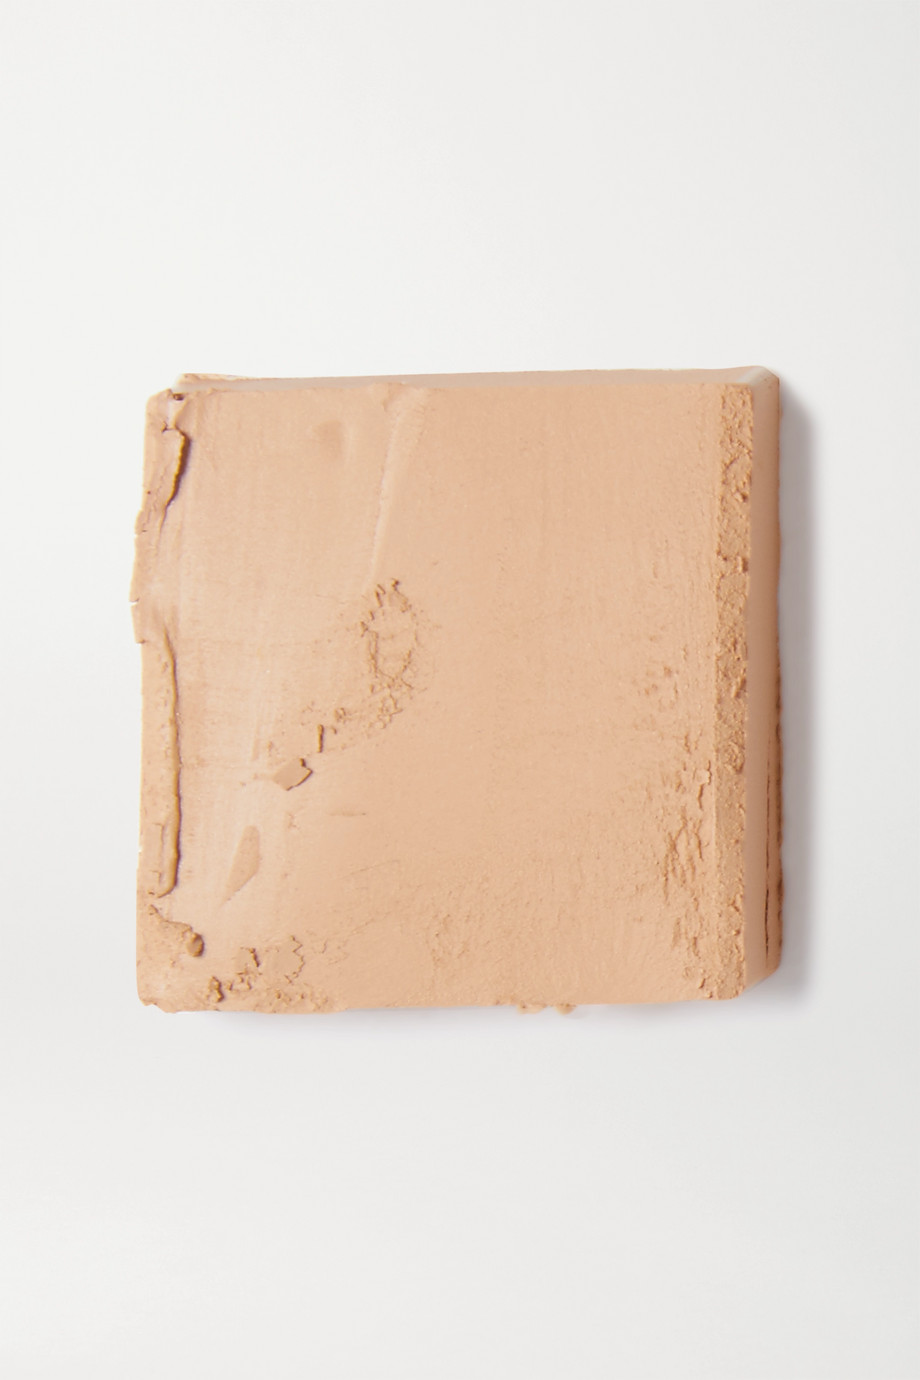 Huda Beauty #FauxFilter Skin Finish Foundation Stick – Panna Cotta 130G – Foundation-Stick